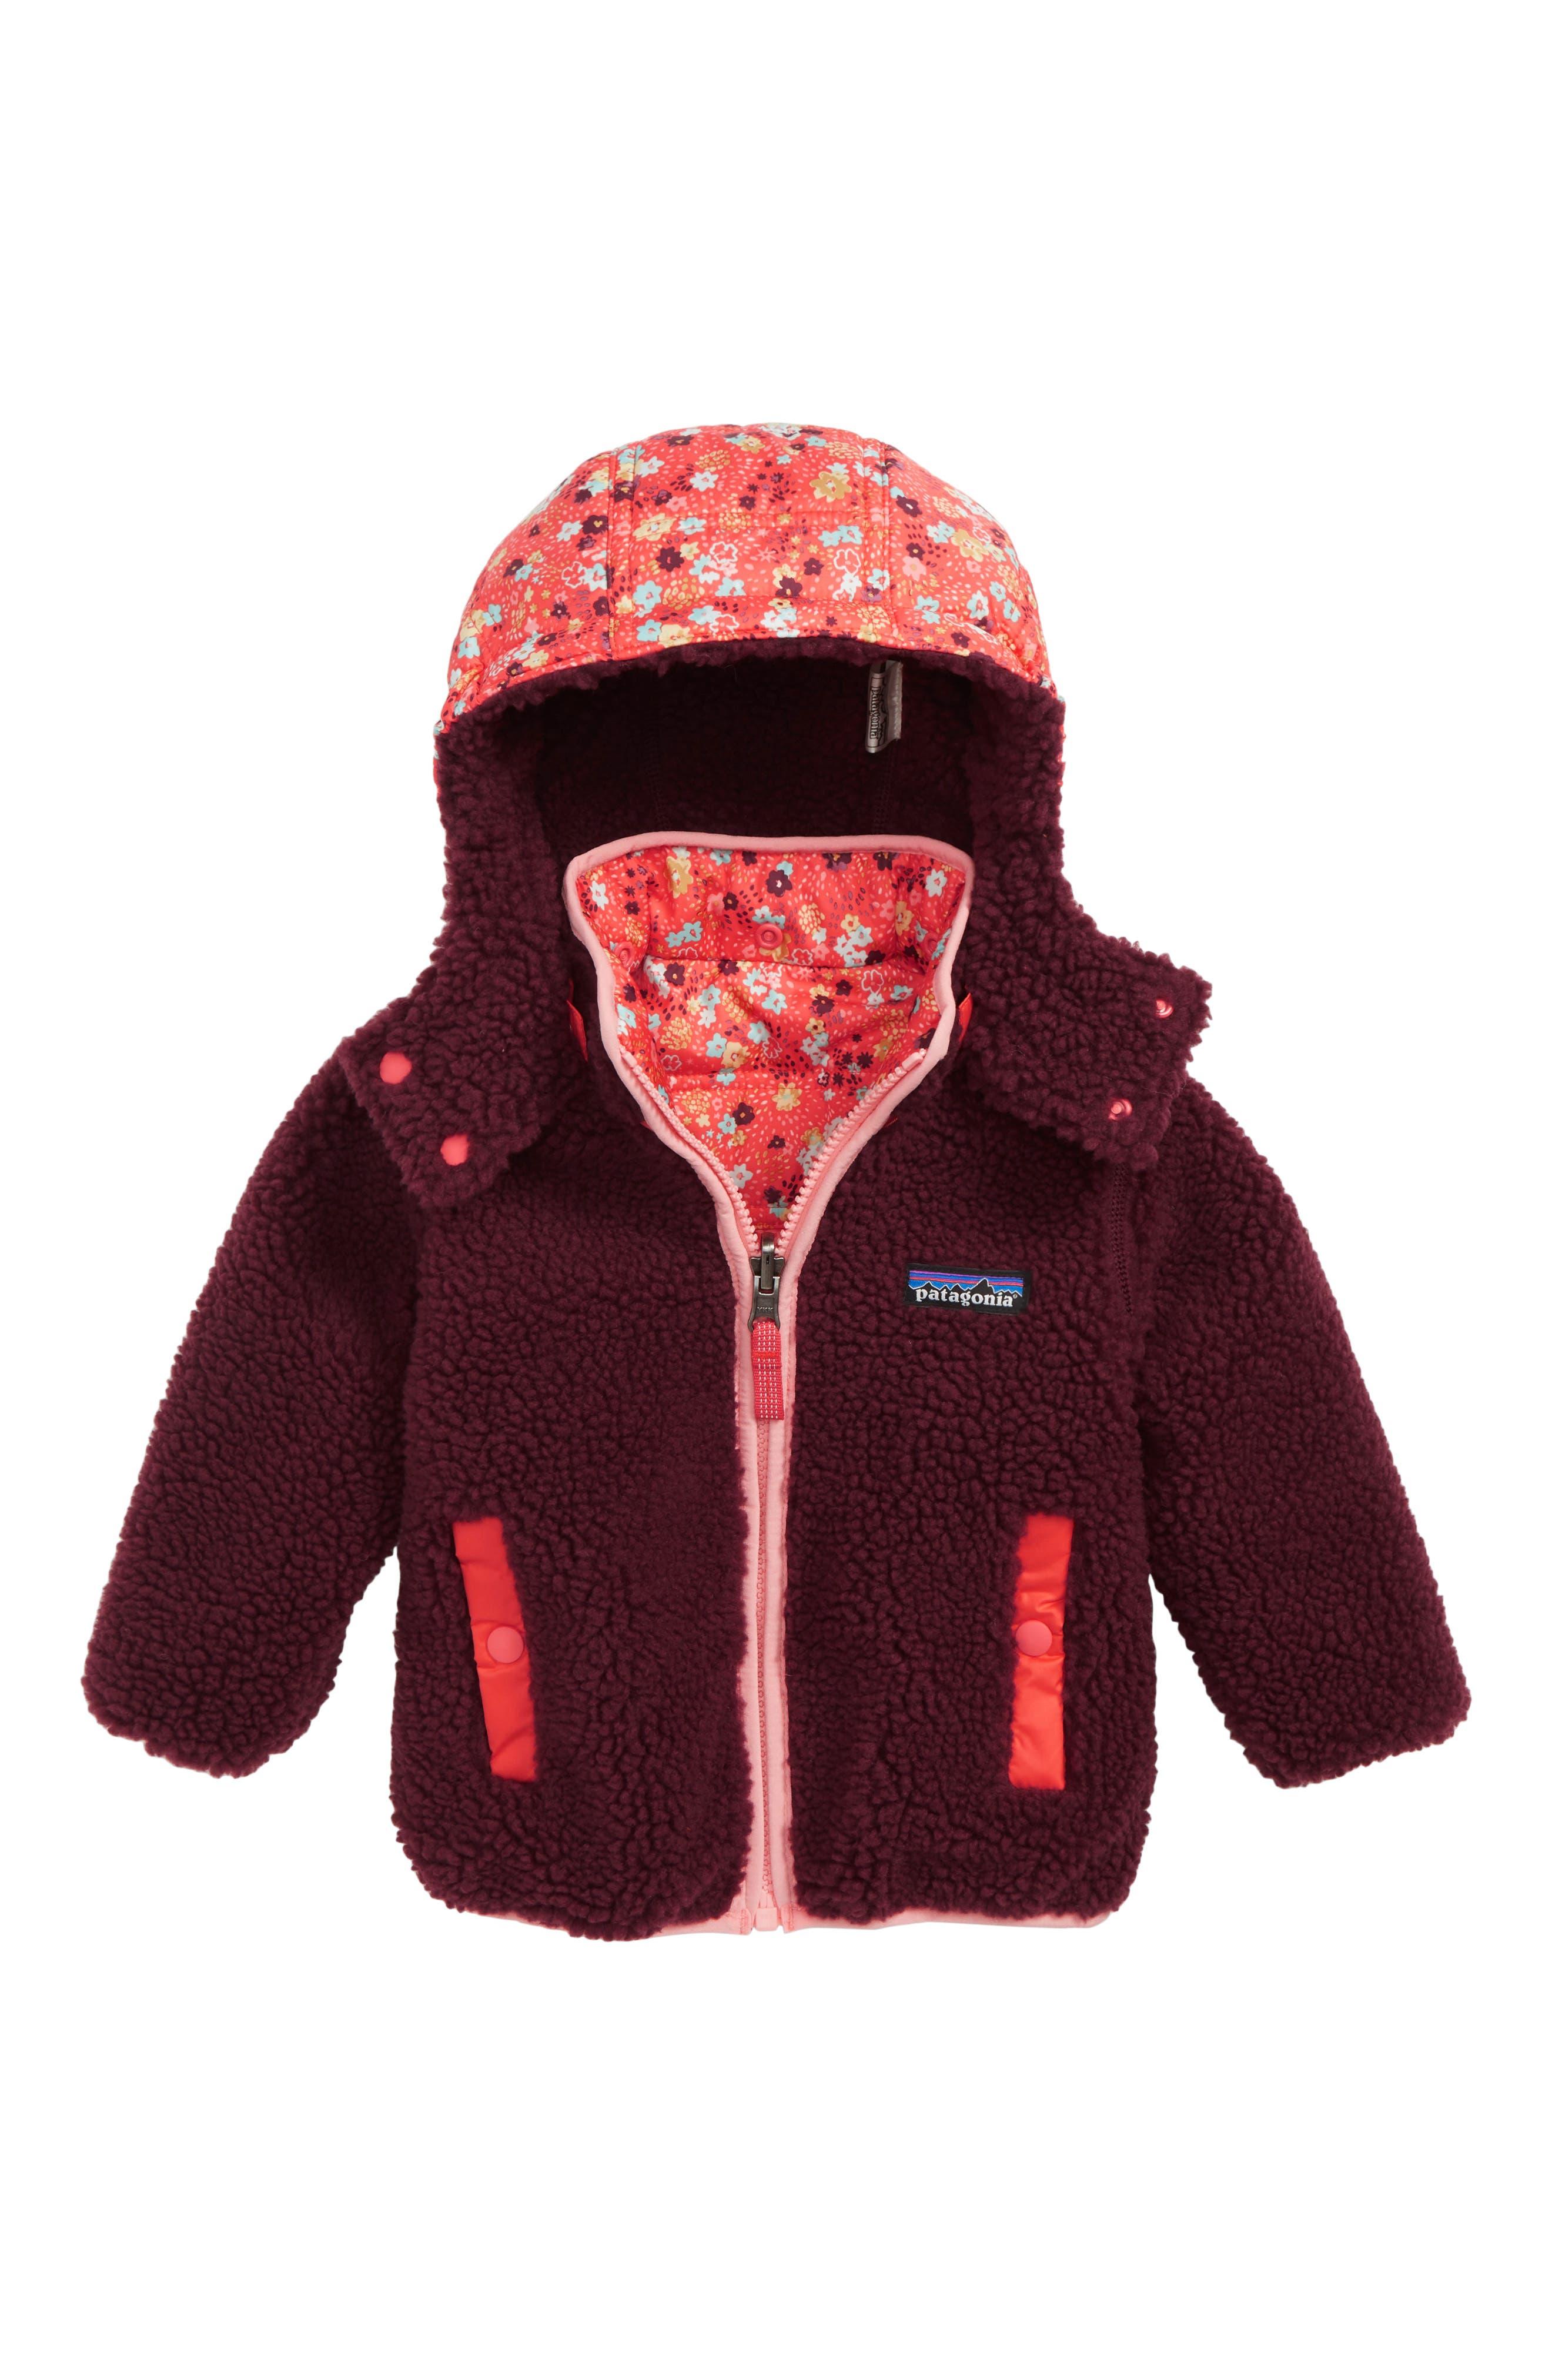 Tribbles Reversible Water Resistant Snow Jacket,                             Alternate thumbnail 2, color,                             UDSC UNTAMED DITSY SPICE CORAL